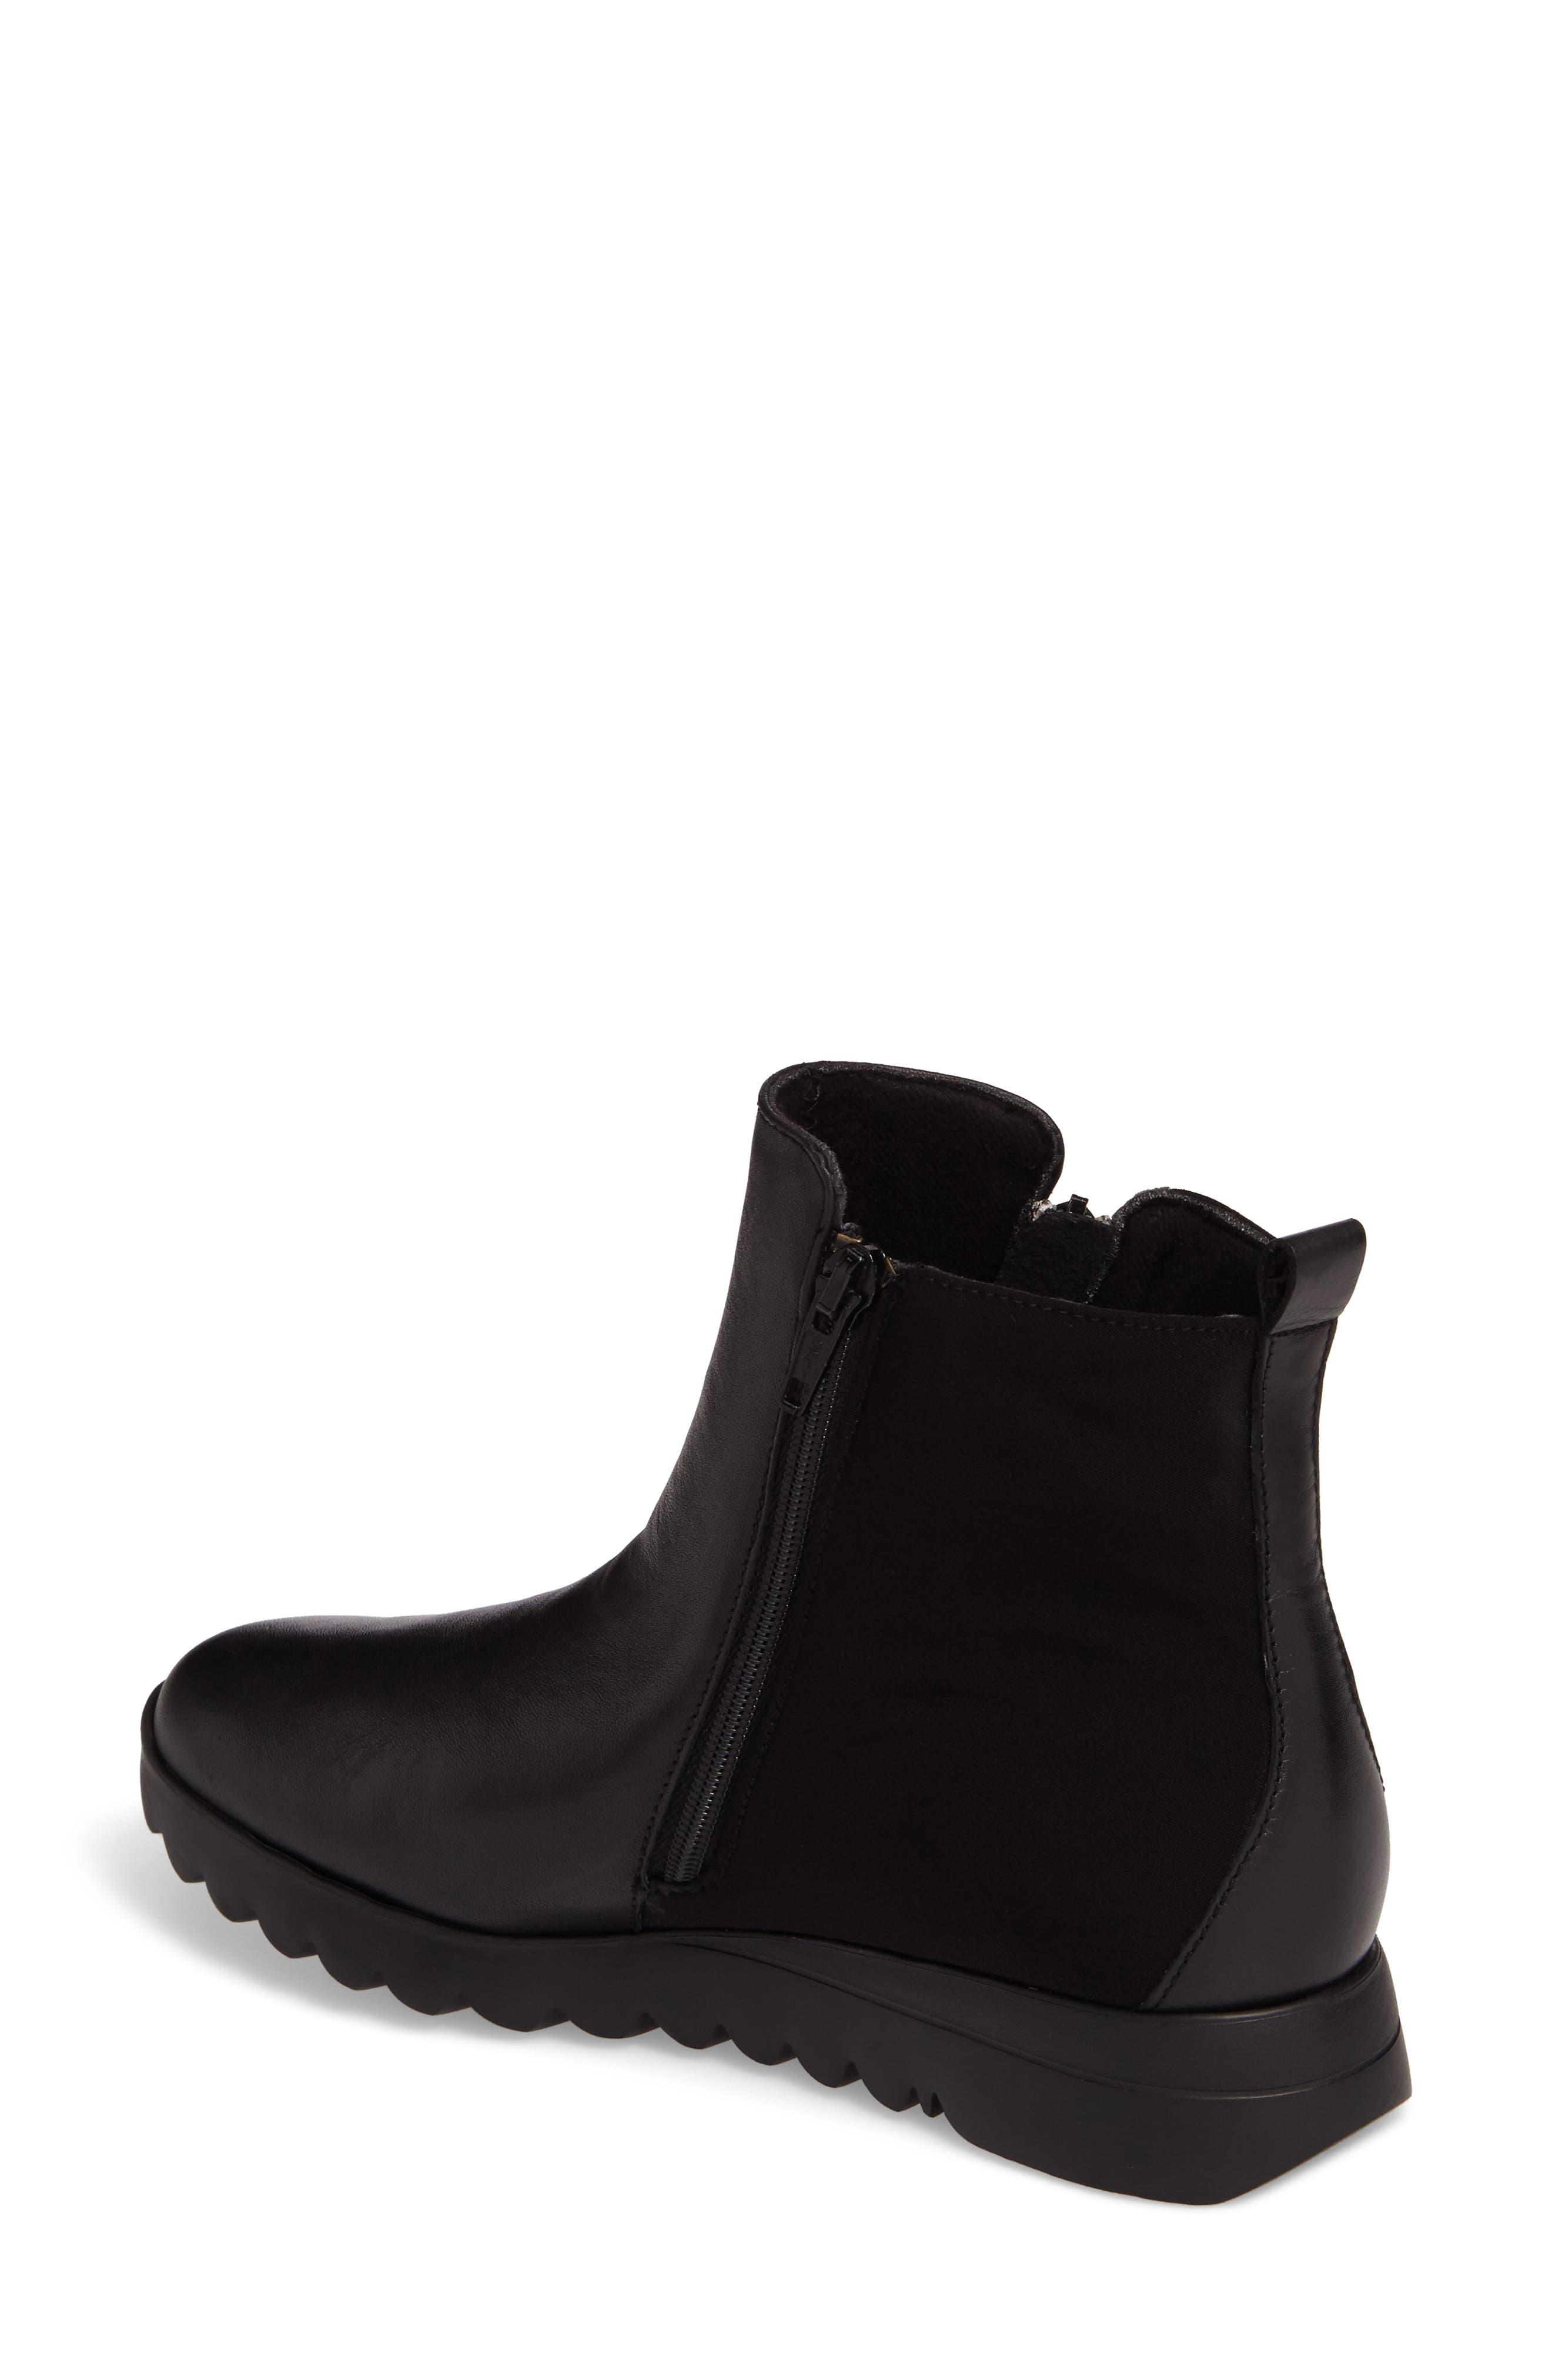 Ashcroft Bootie,                             Alternate thumbnail 2, color,                             Black Leather